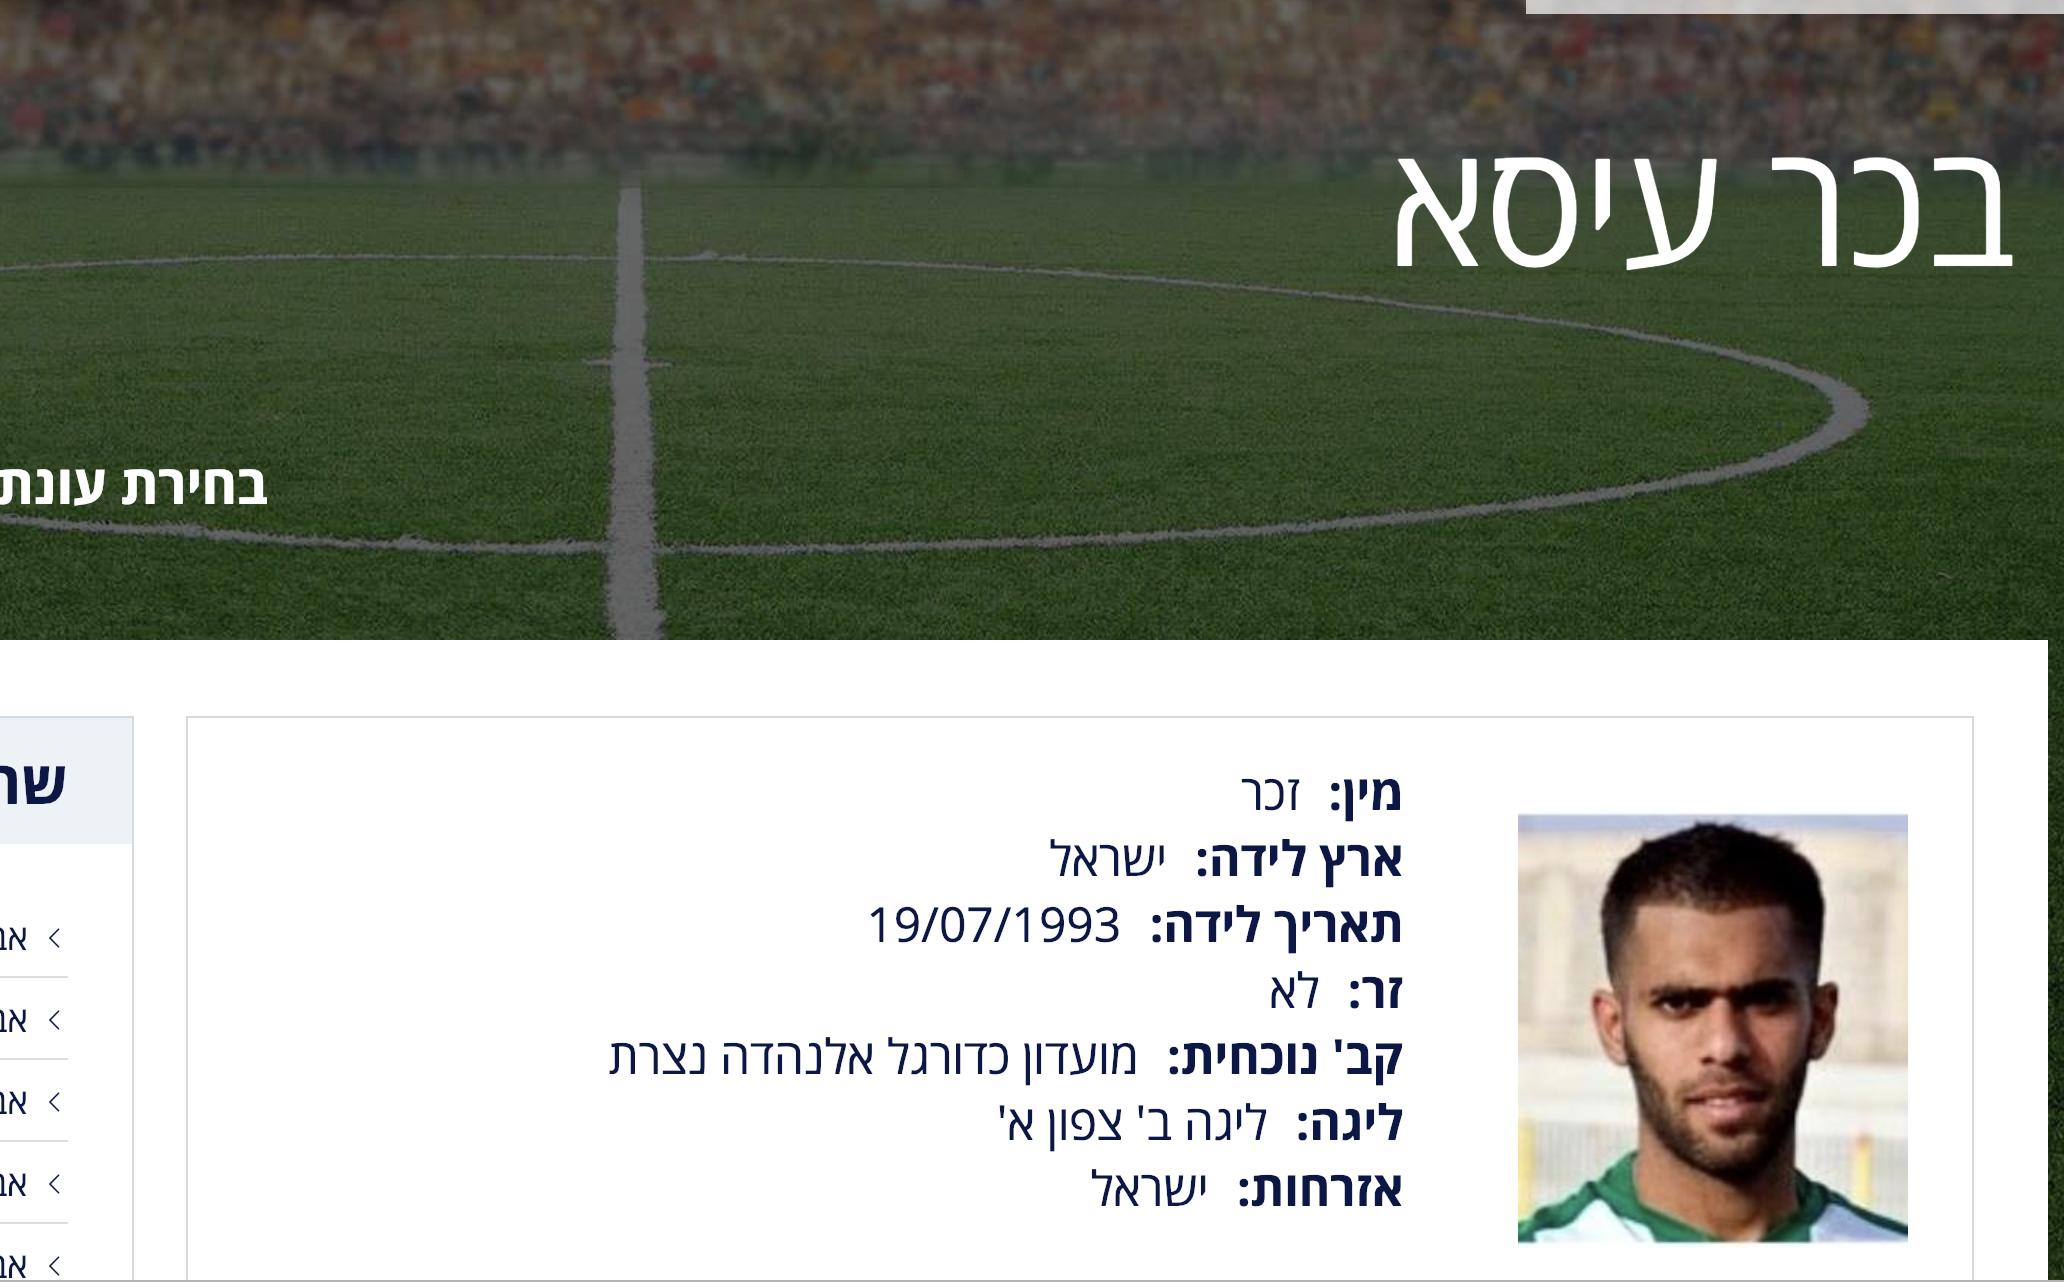 Bakr Eissa's profile in the Israeli Association website (IFA)